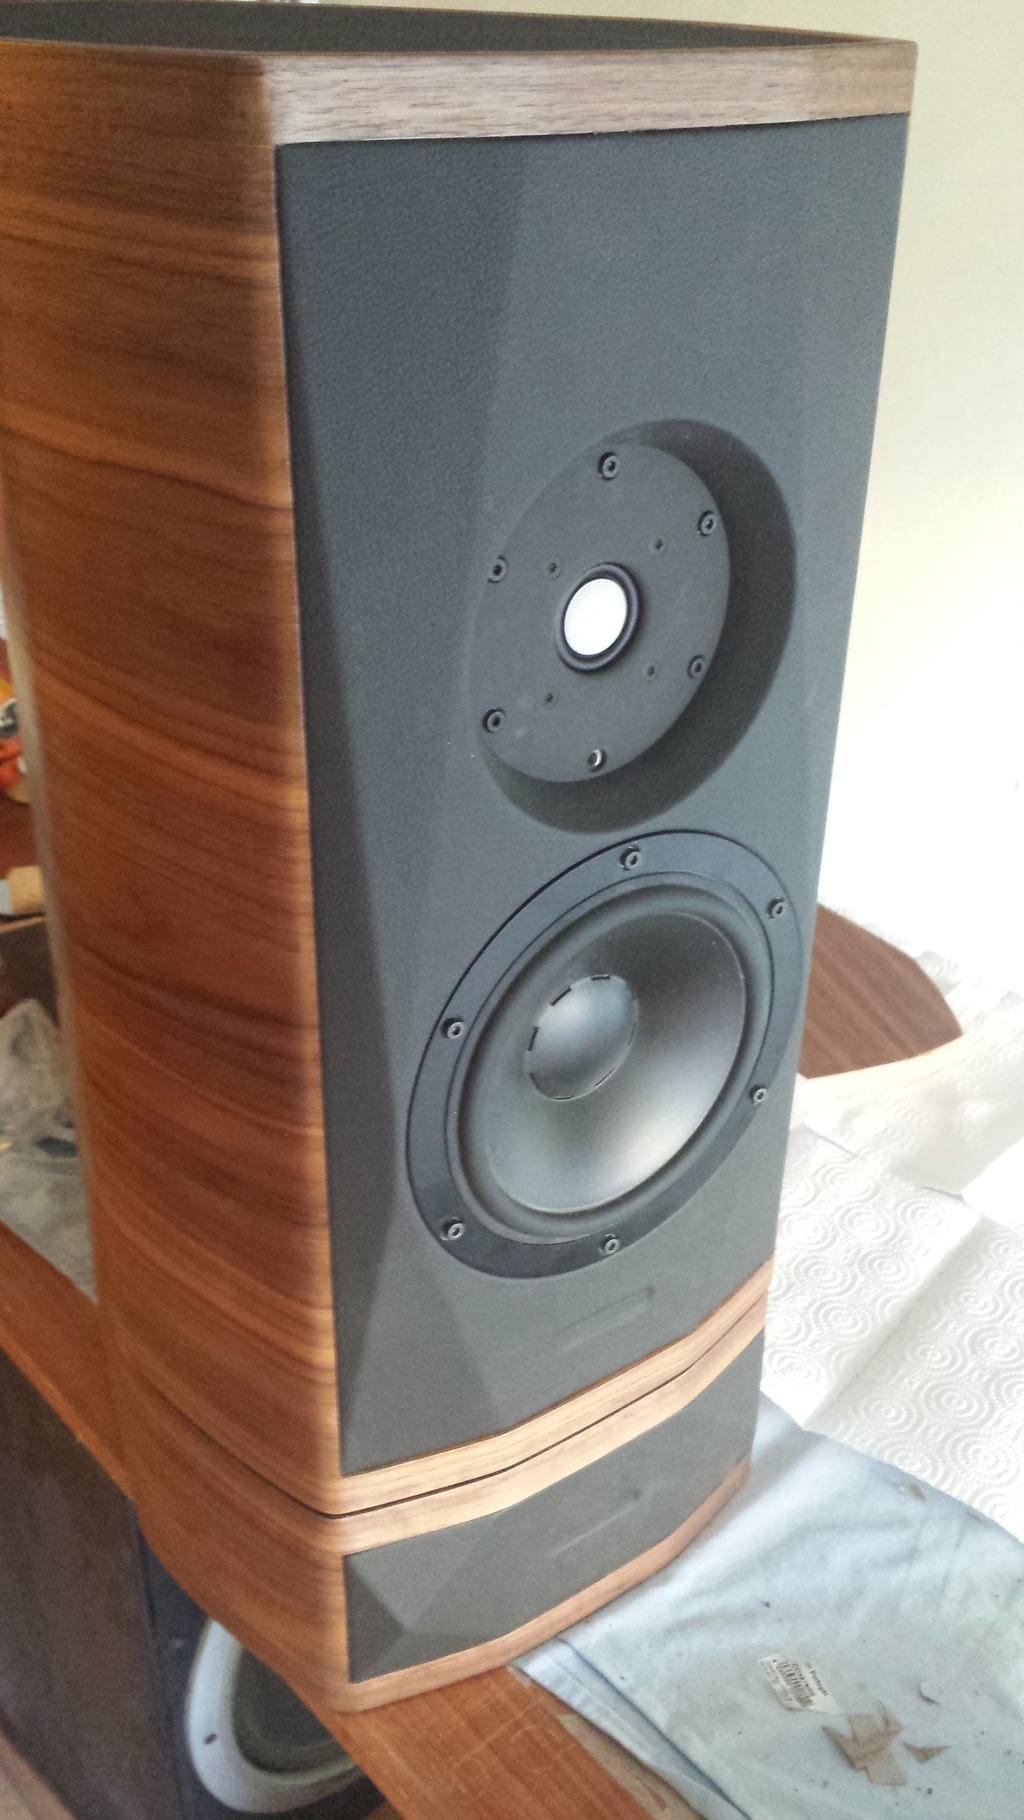 Monitores Audiotechnology C-Quenze 18H521706SD + Seas Excel T29MF001 - Página 6 20150801_085330_zpsi2yhjpl2